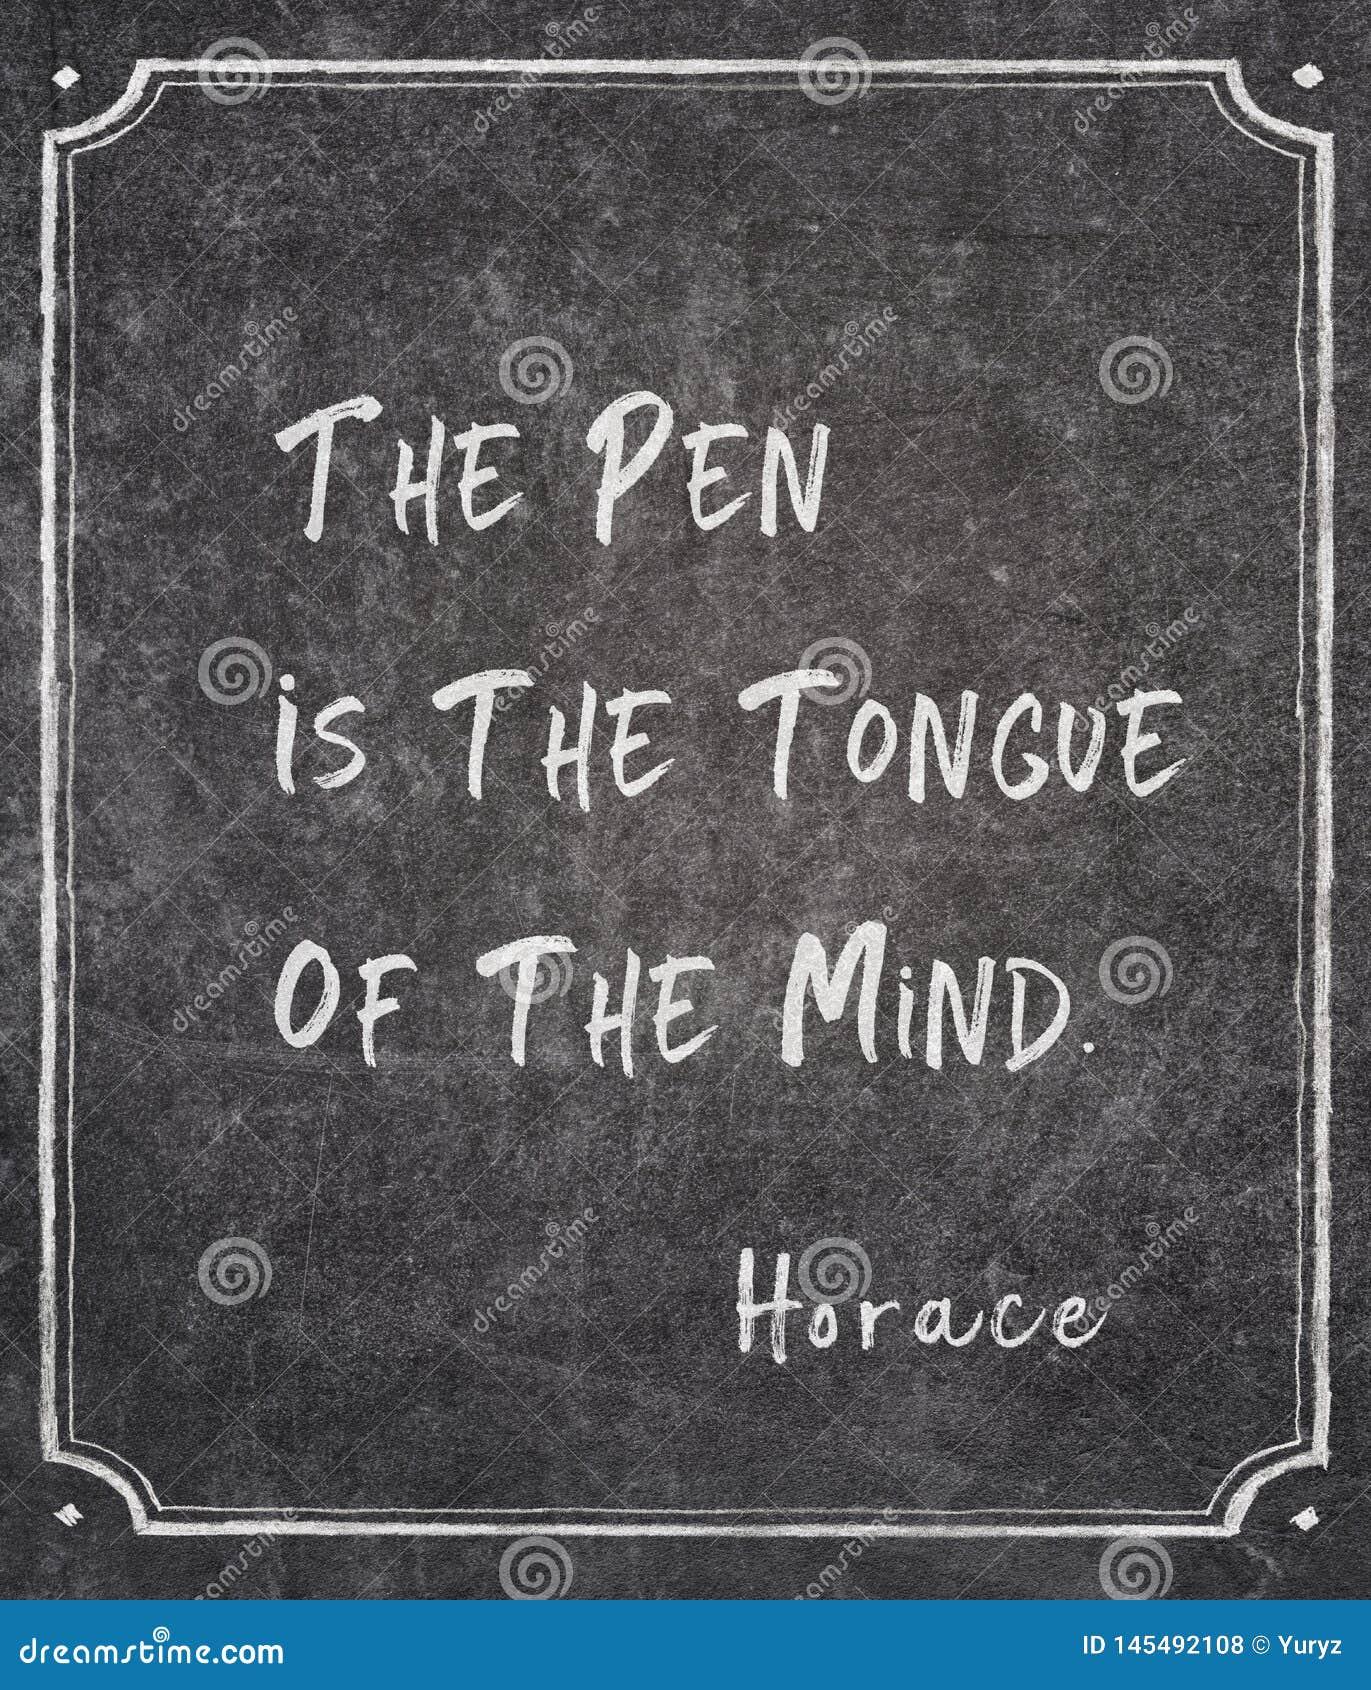 Pen is tongue Horace quote